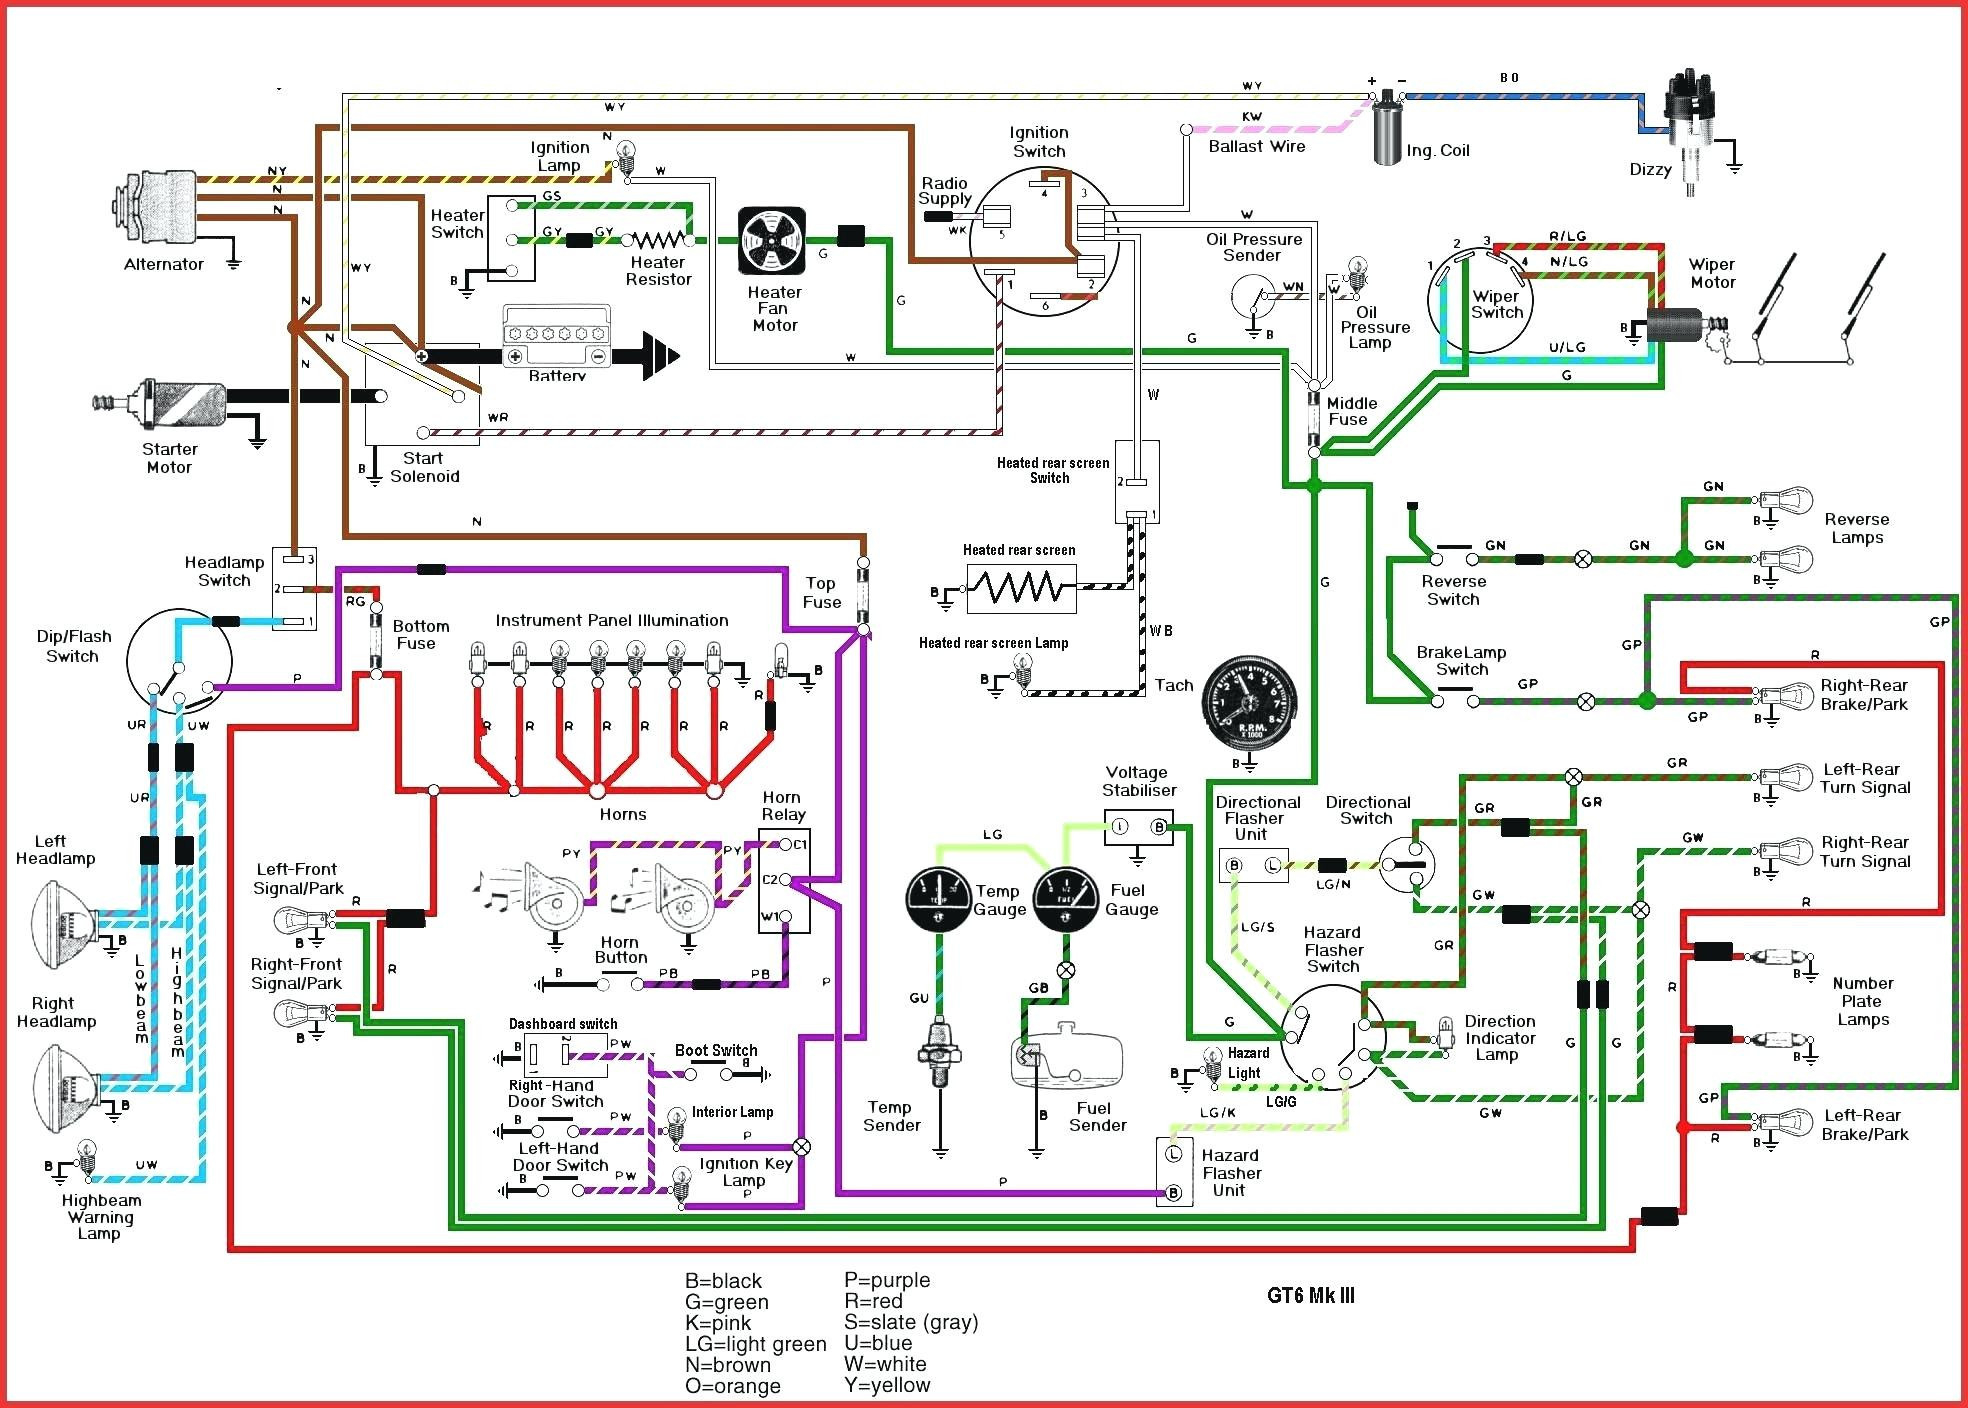 Residential Wiring Diagrams Residential Wiring Diagram Wiring Diagrams Dash